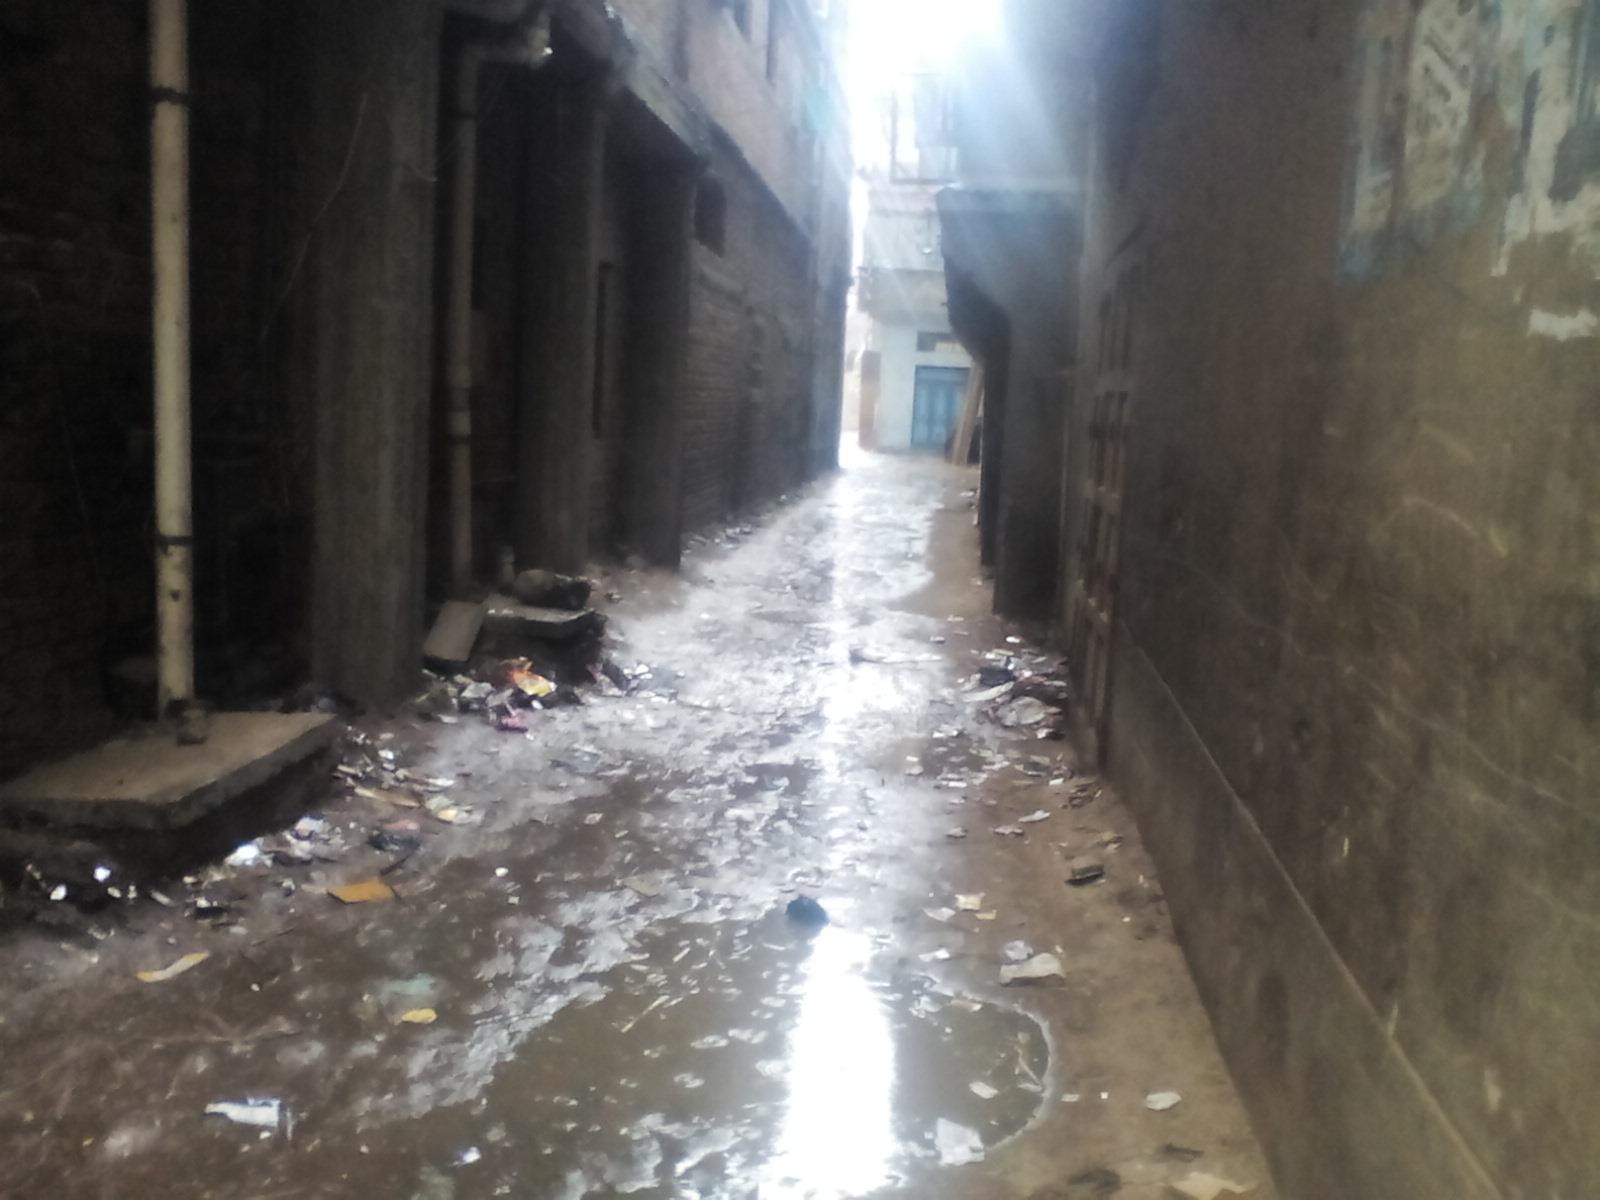 تجمع مياه الامطار بالشوارع